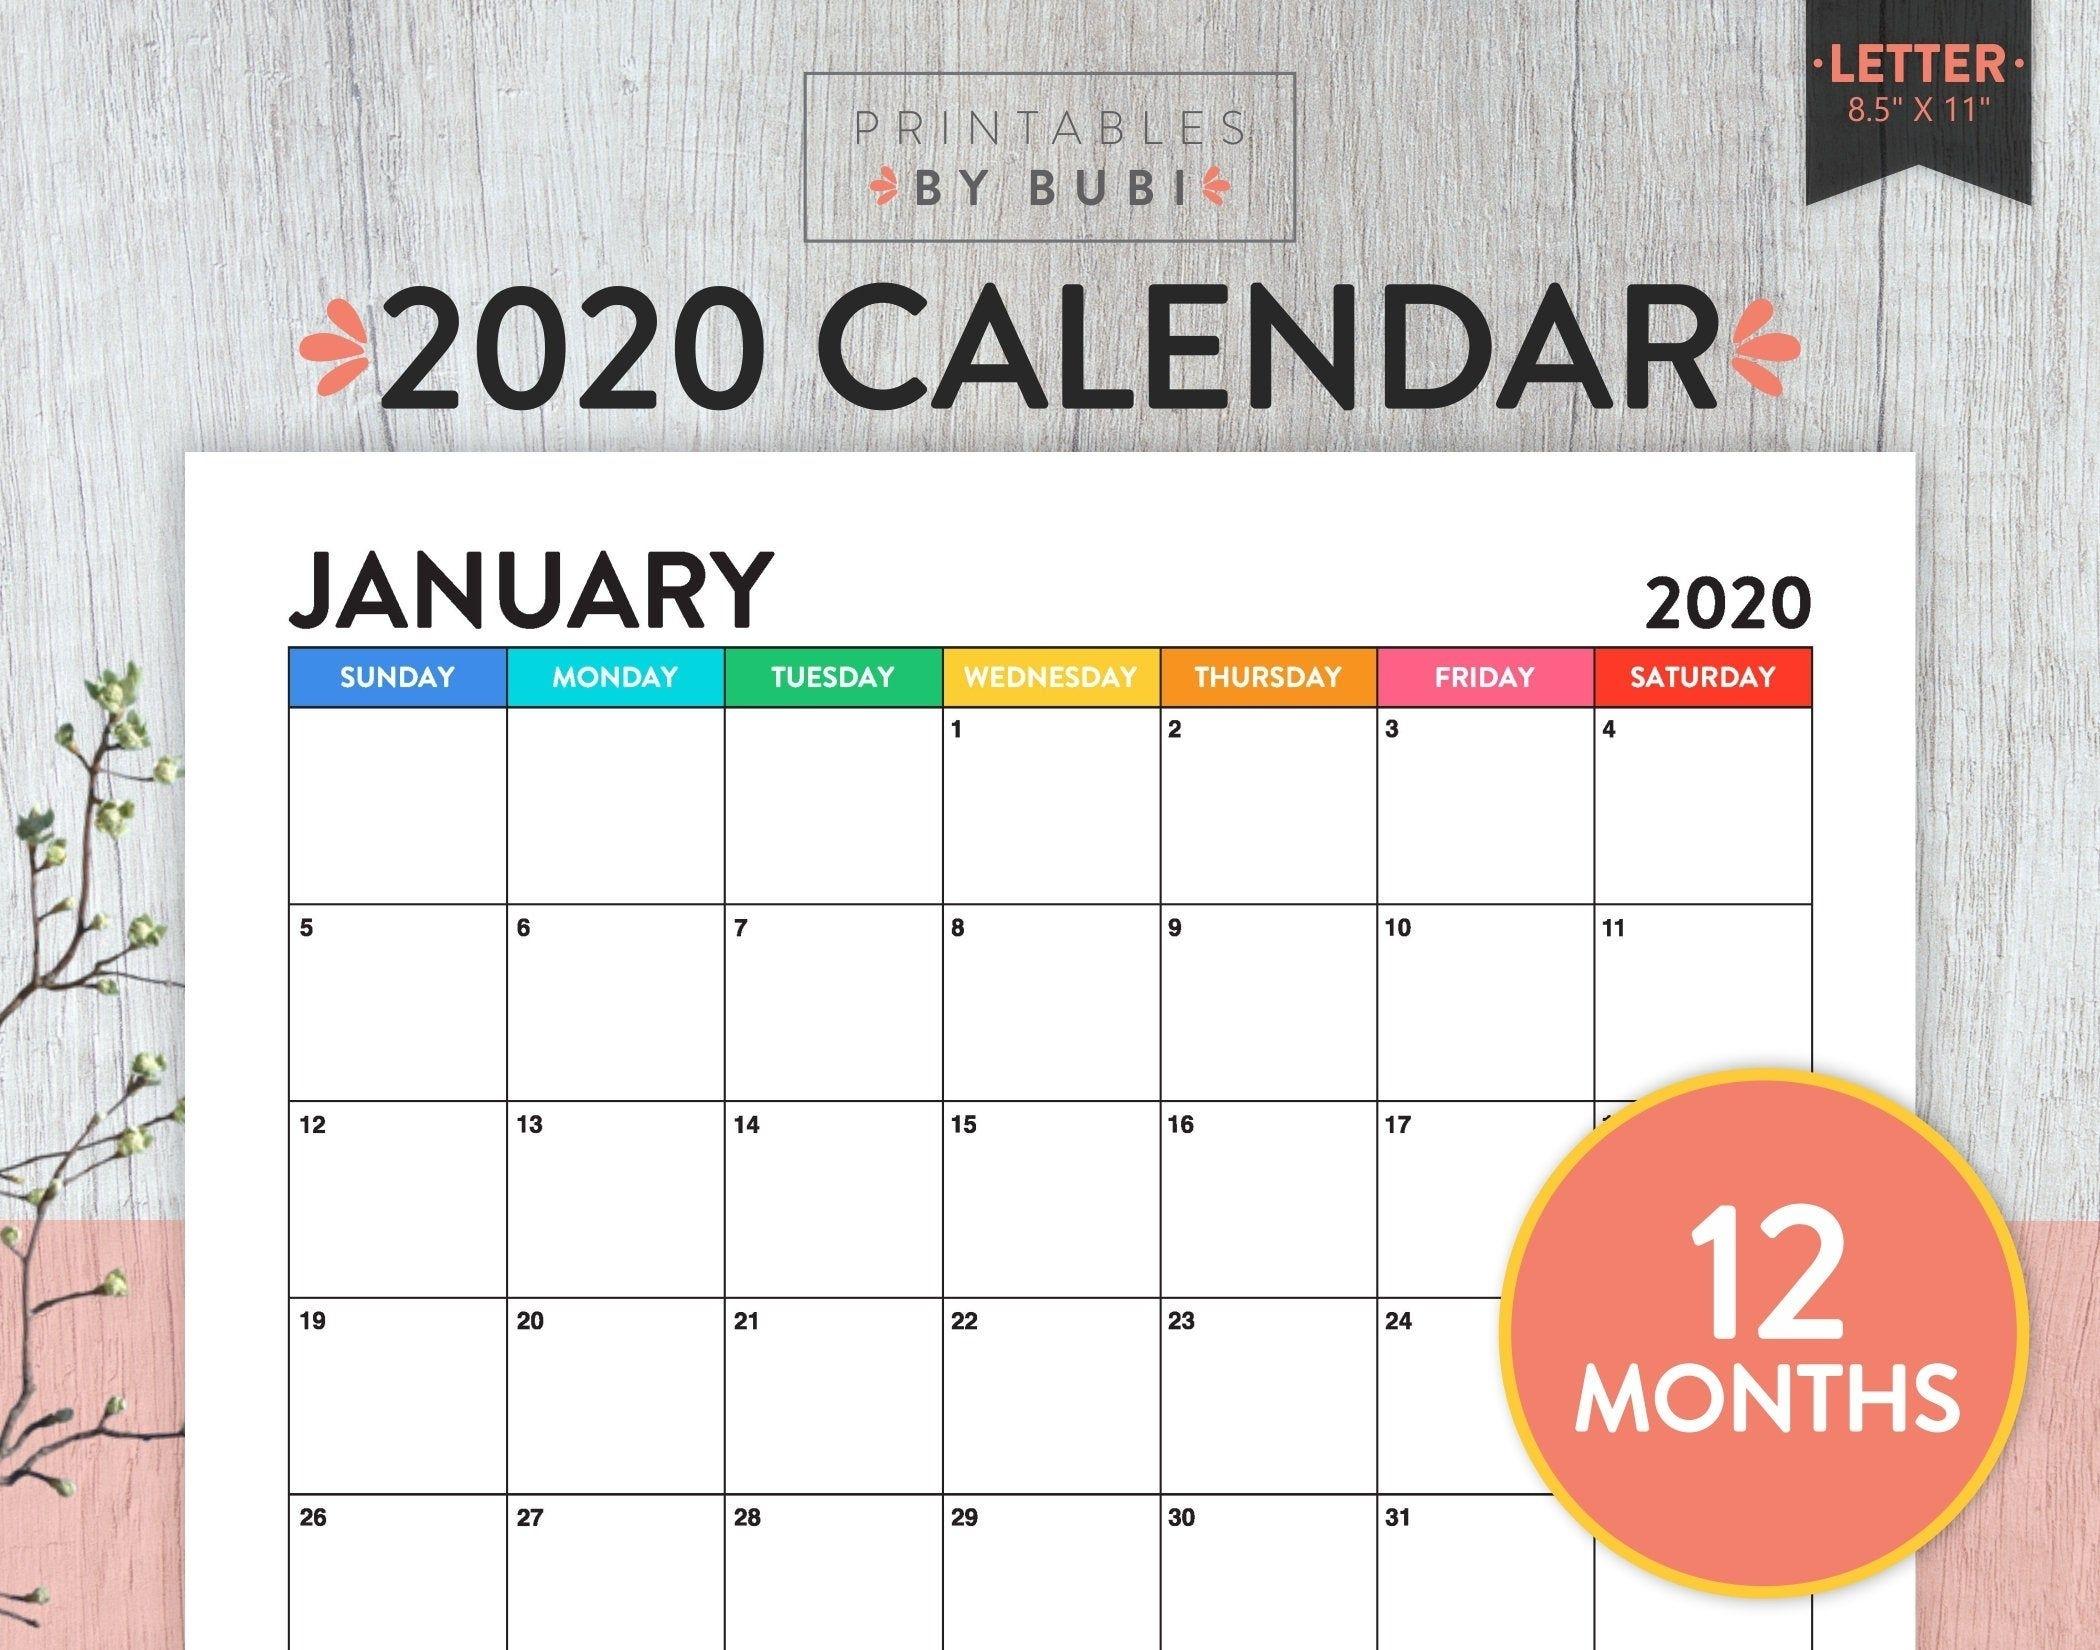 Sale! Printable Monthly Calendar 2020, Calendar Printable within 8.5 X 11 Free Printable Monthly Calendar 2020